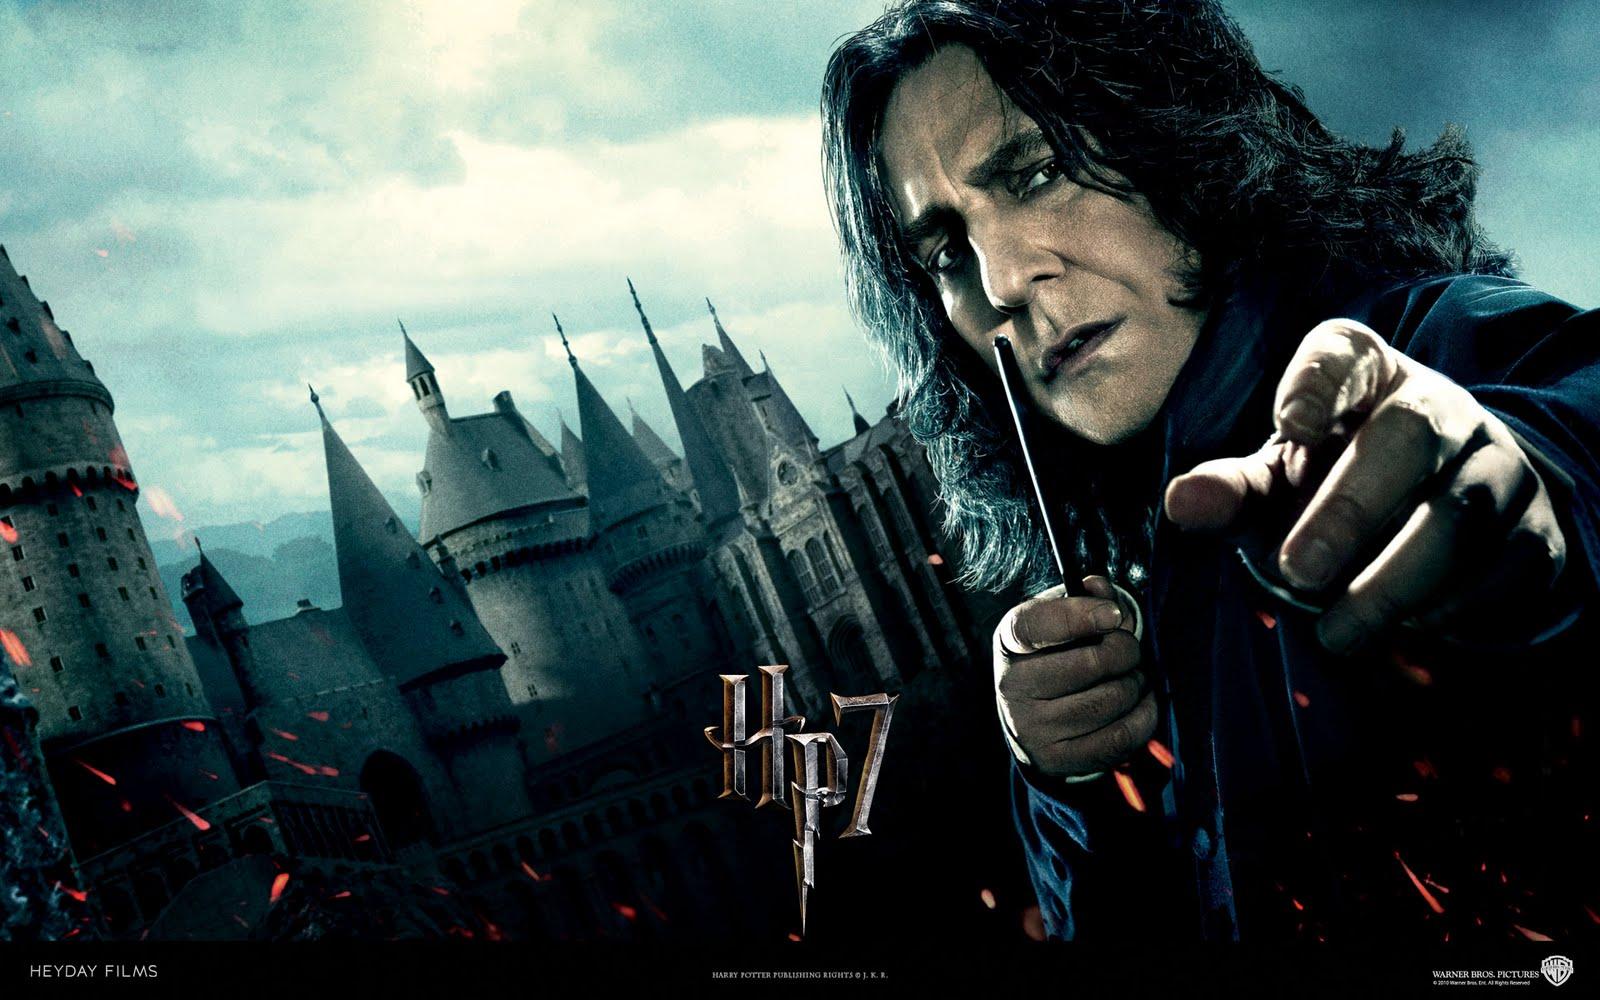 Car Arini And Tattoos Kafy Harry Potter 7 Part 2 Snape Hd Wallpaper